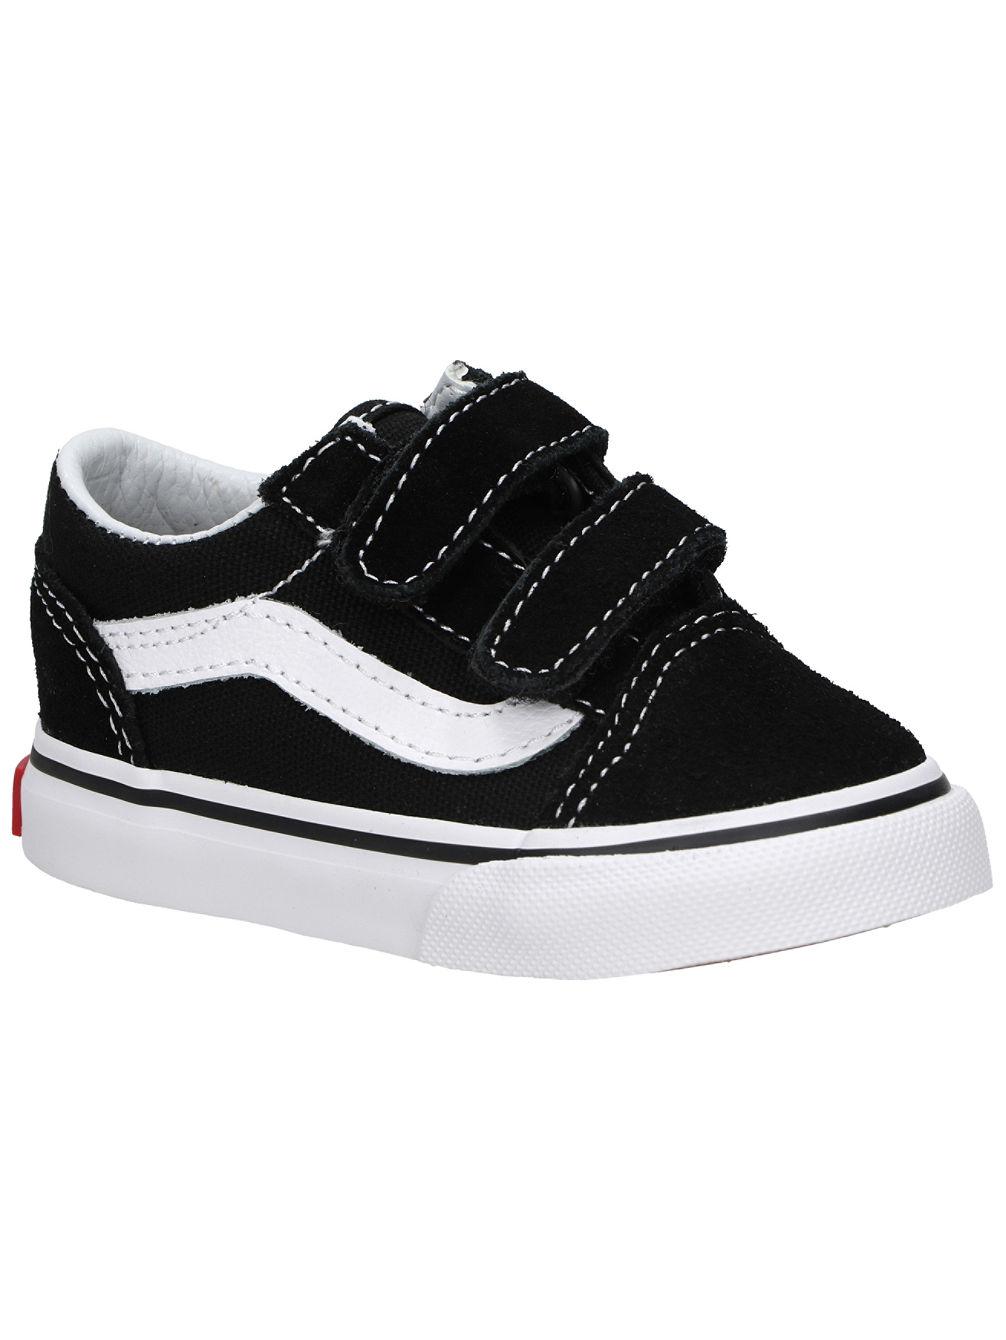 d58a387b6d6c Buy Vans Old Skool V Sneakers Baby online at Blue Tomato